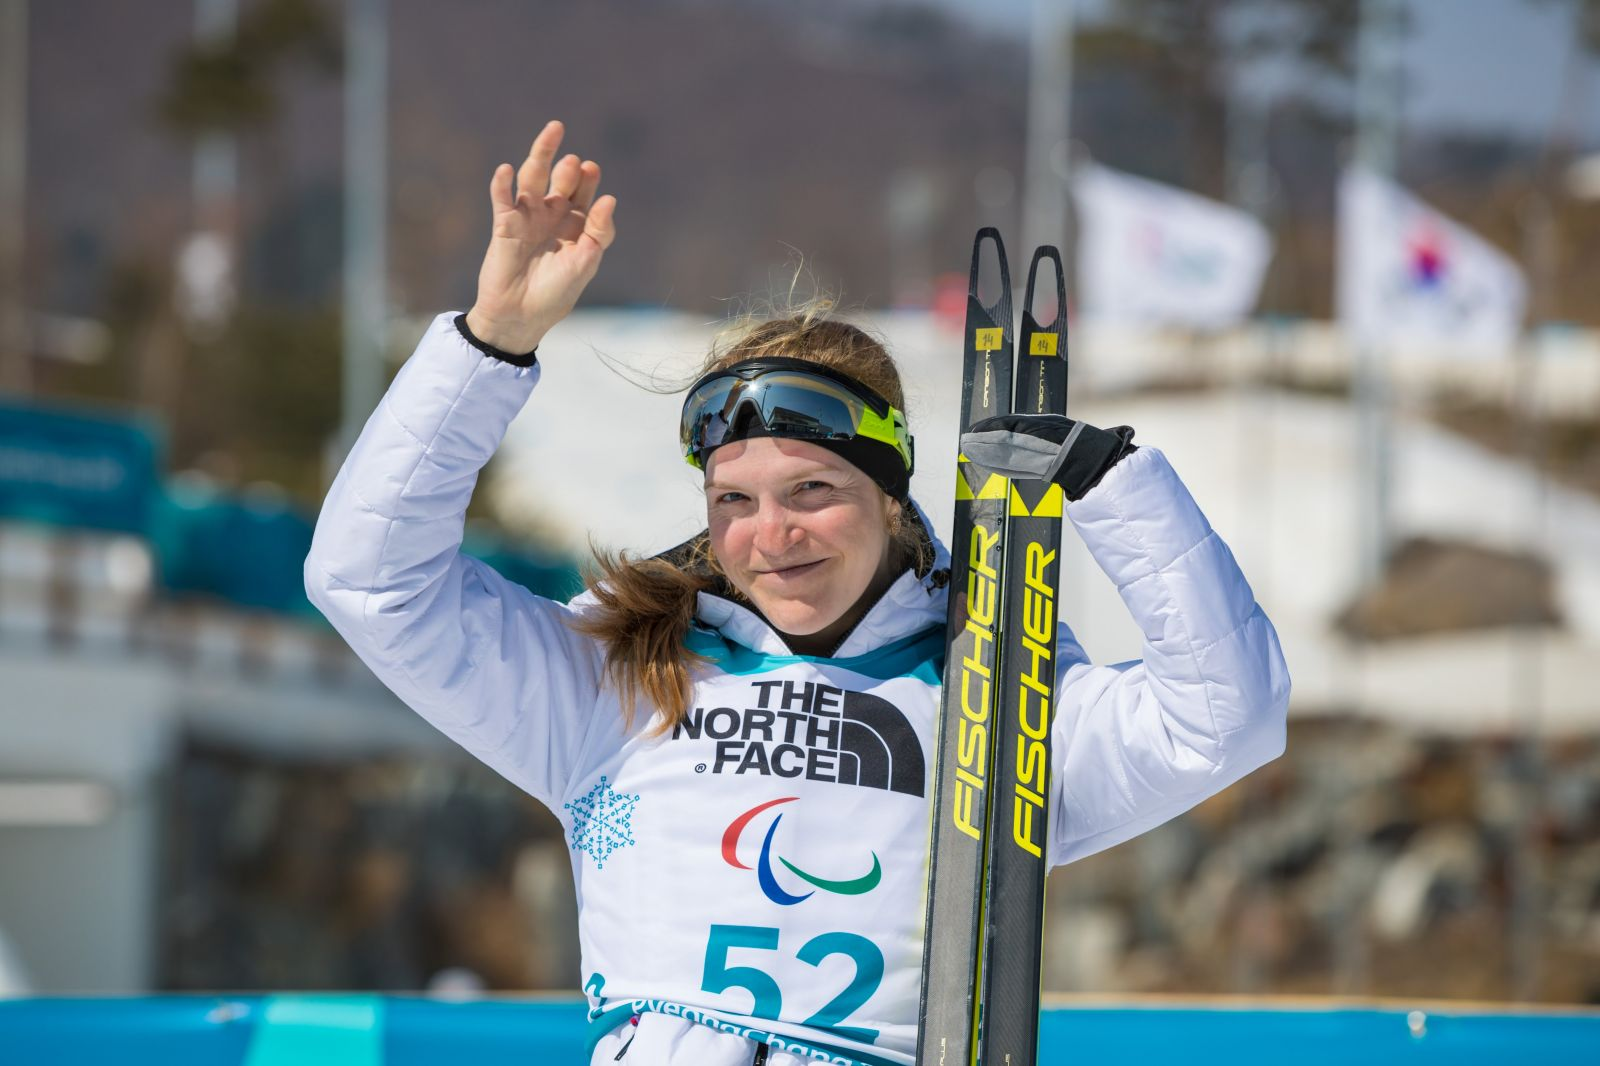 Голосуйте за Екатерину Румянцеву на сайте Международного паралимпийского комитета за звание лучшей спортсменки Паралимпиады-2018 в г. Пхенчхане!